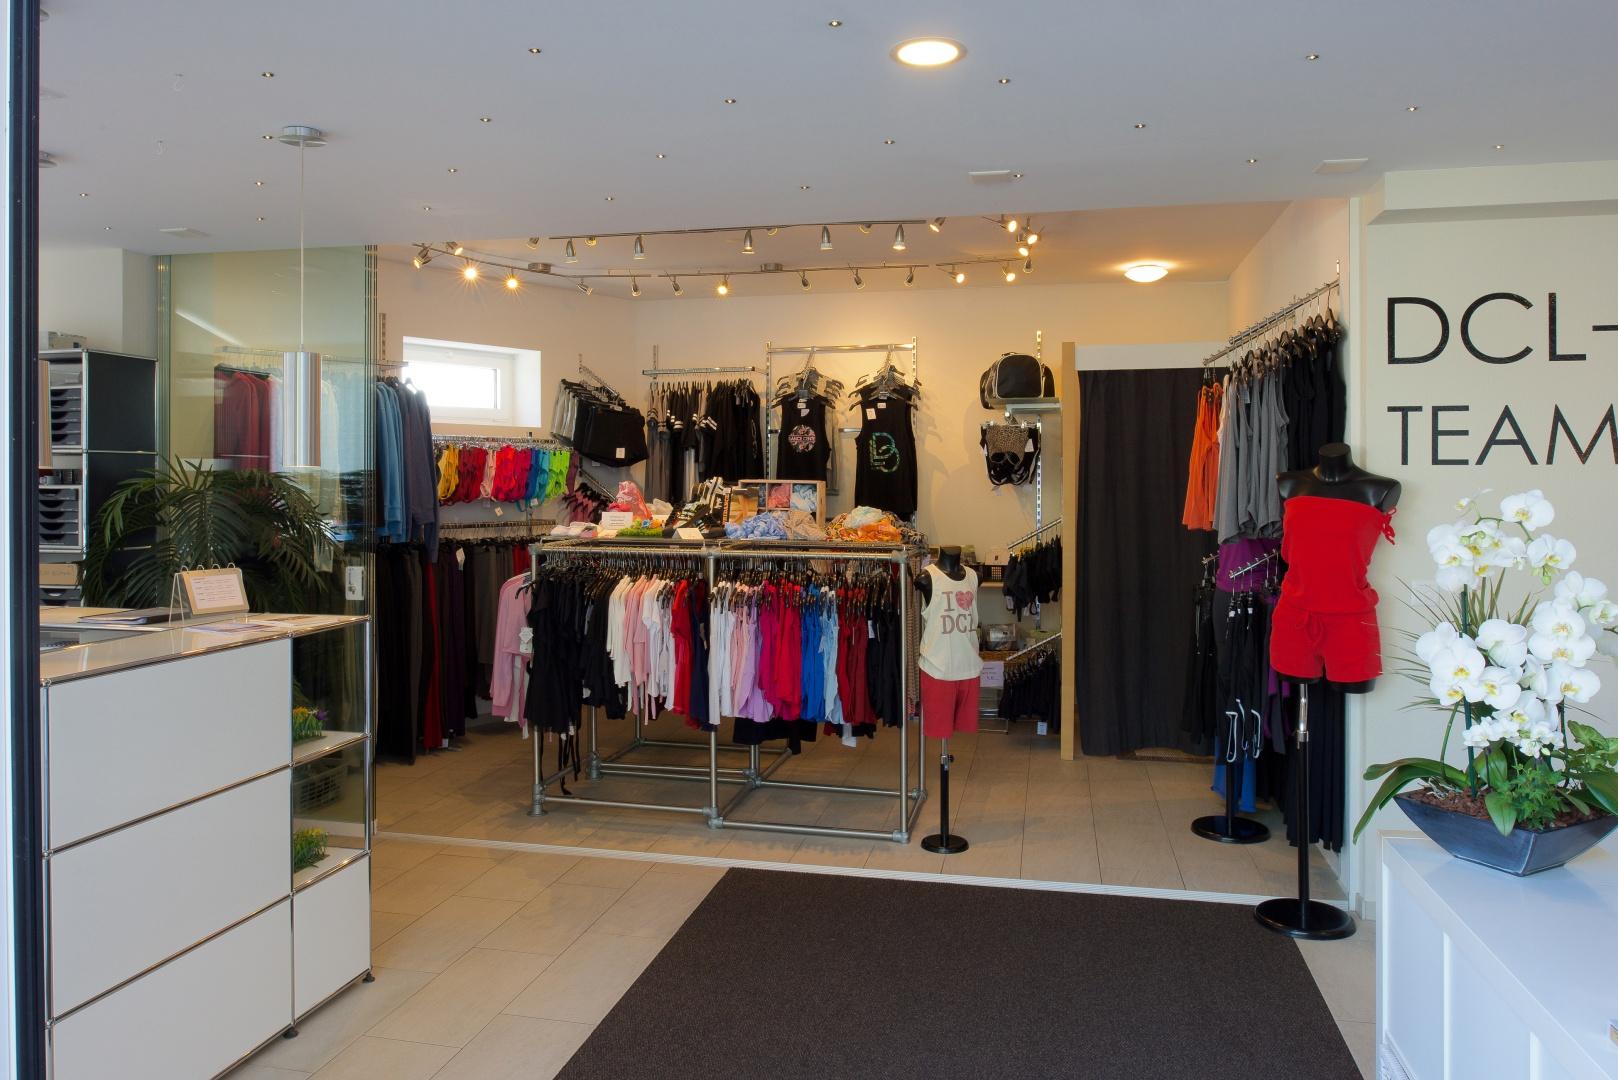 Réceptionsbereich und Shop © Reto Meier, Kirchberg